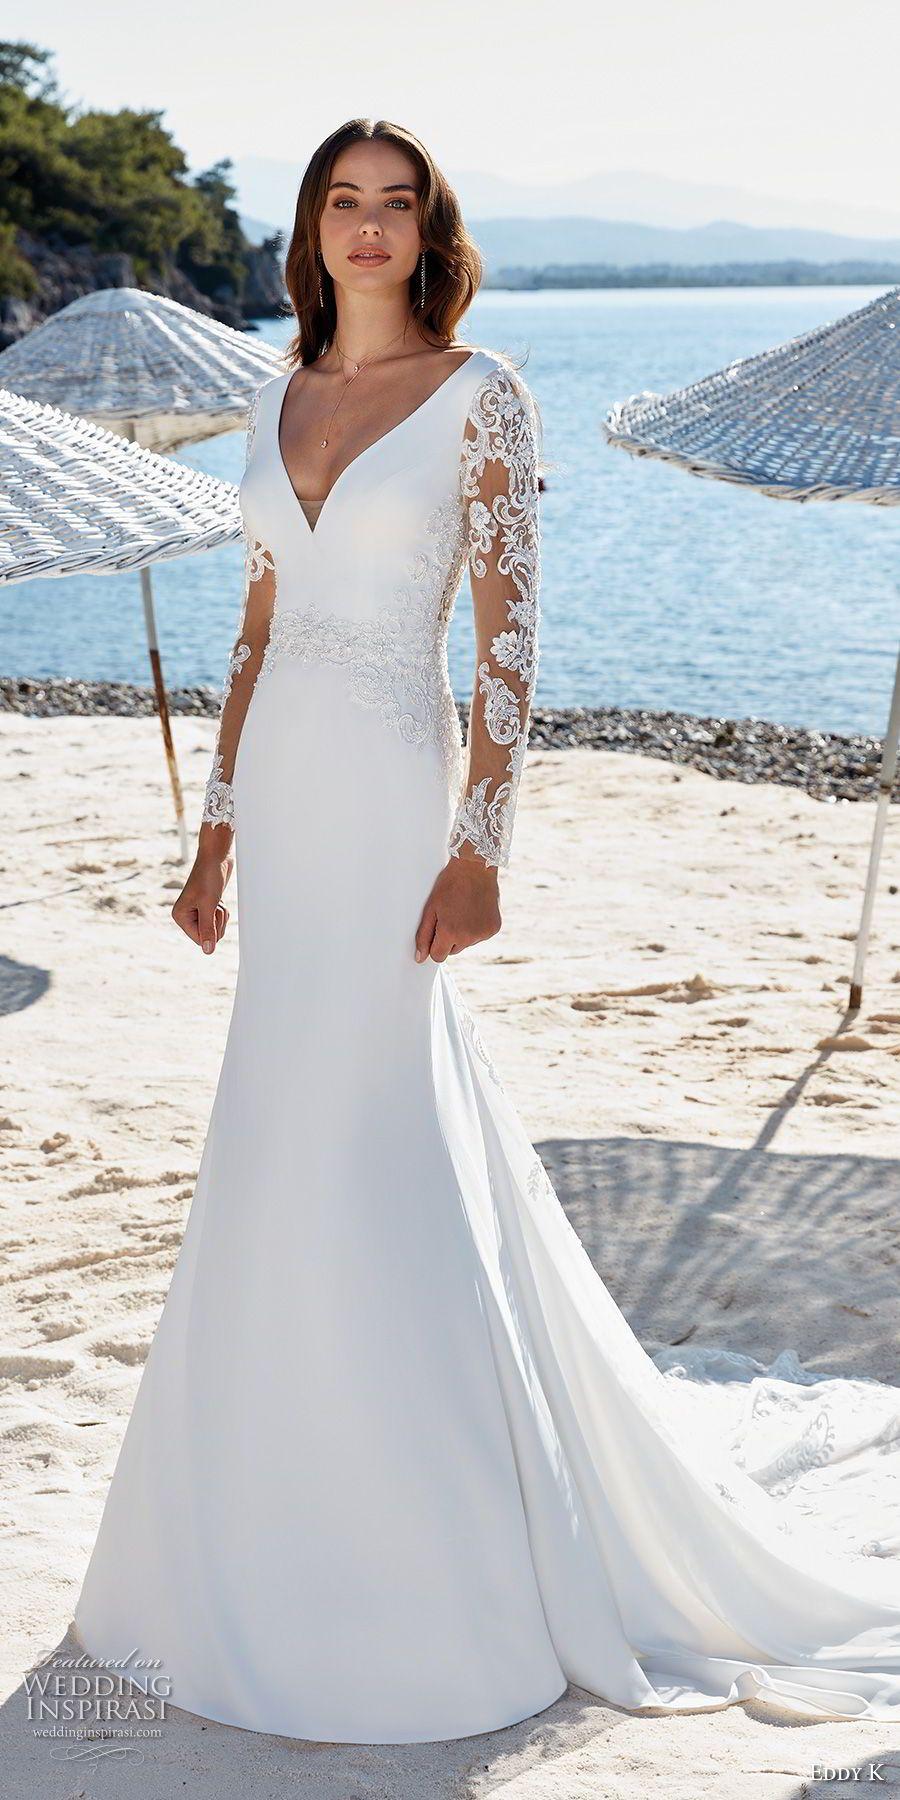 Eddy k dreams wedding dresses vestidos de festa e casamentos